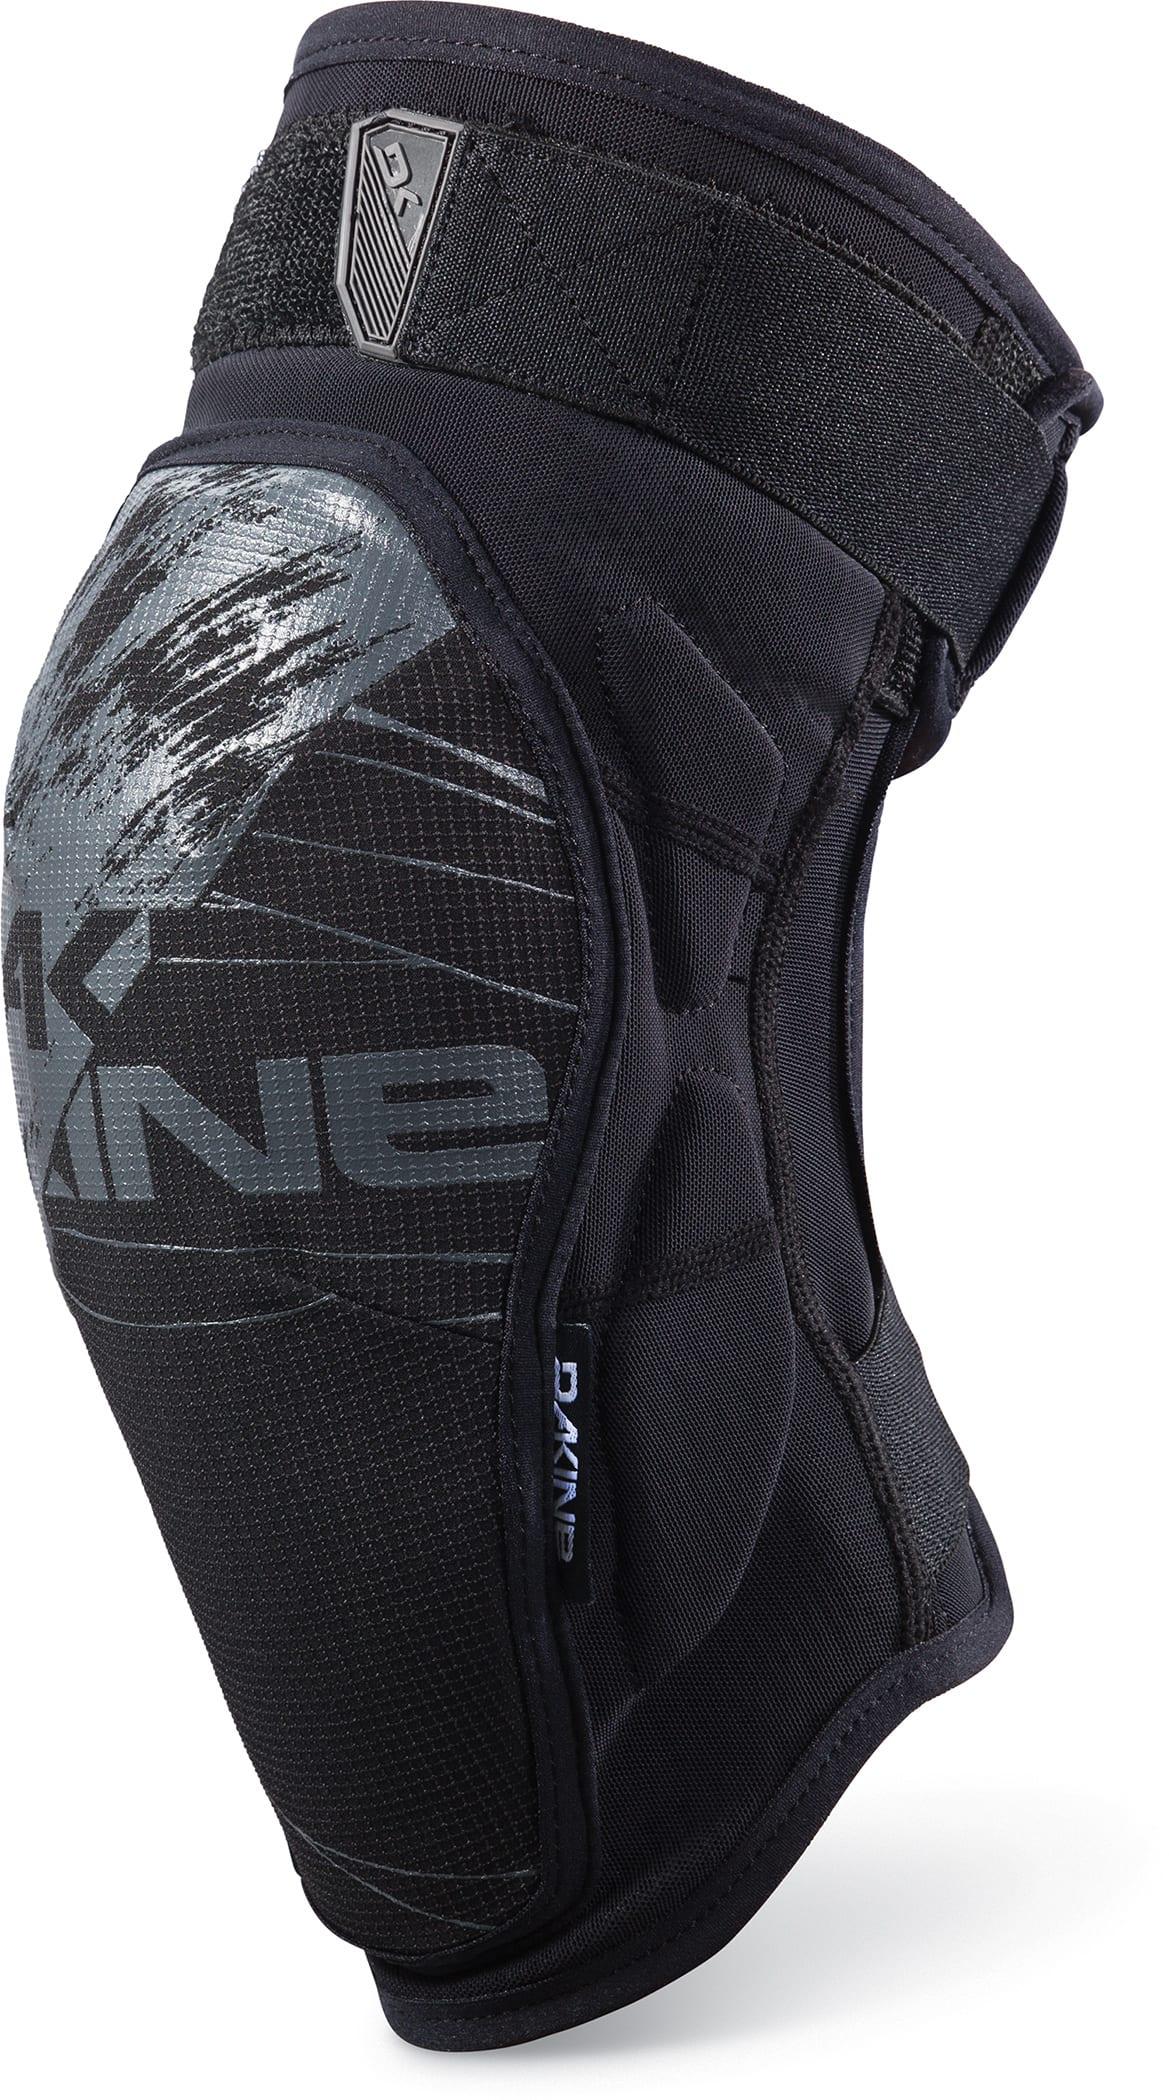 Image of Dakine Anthem Knee Pads